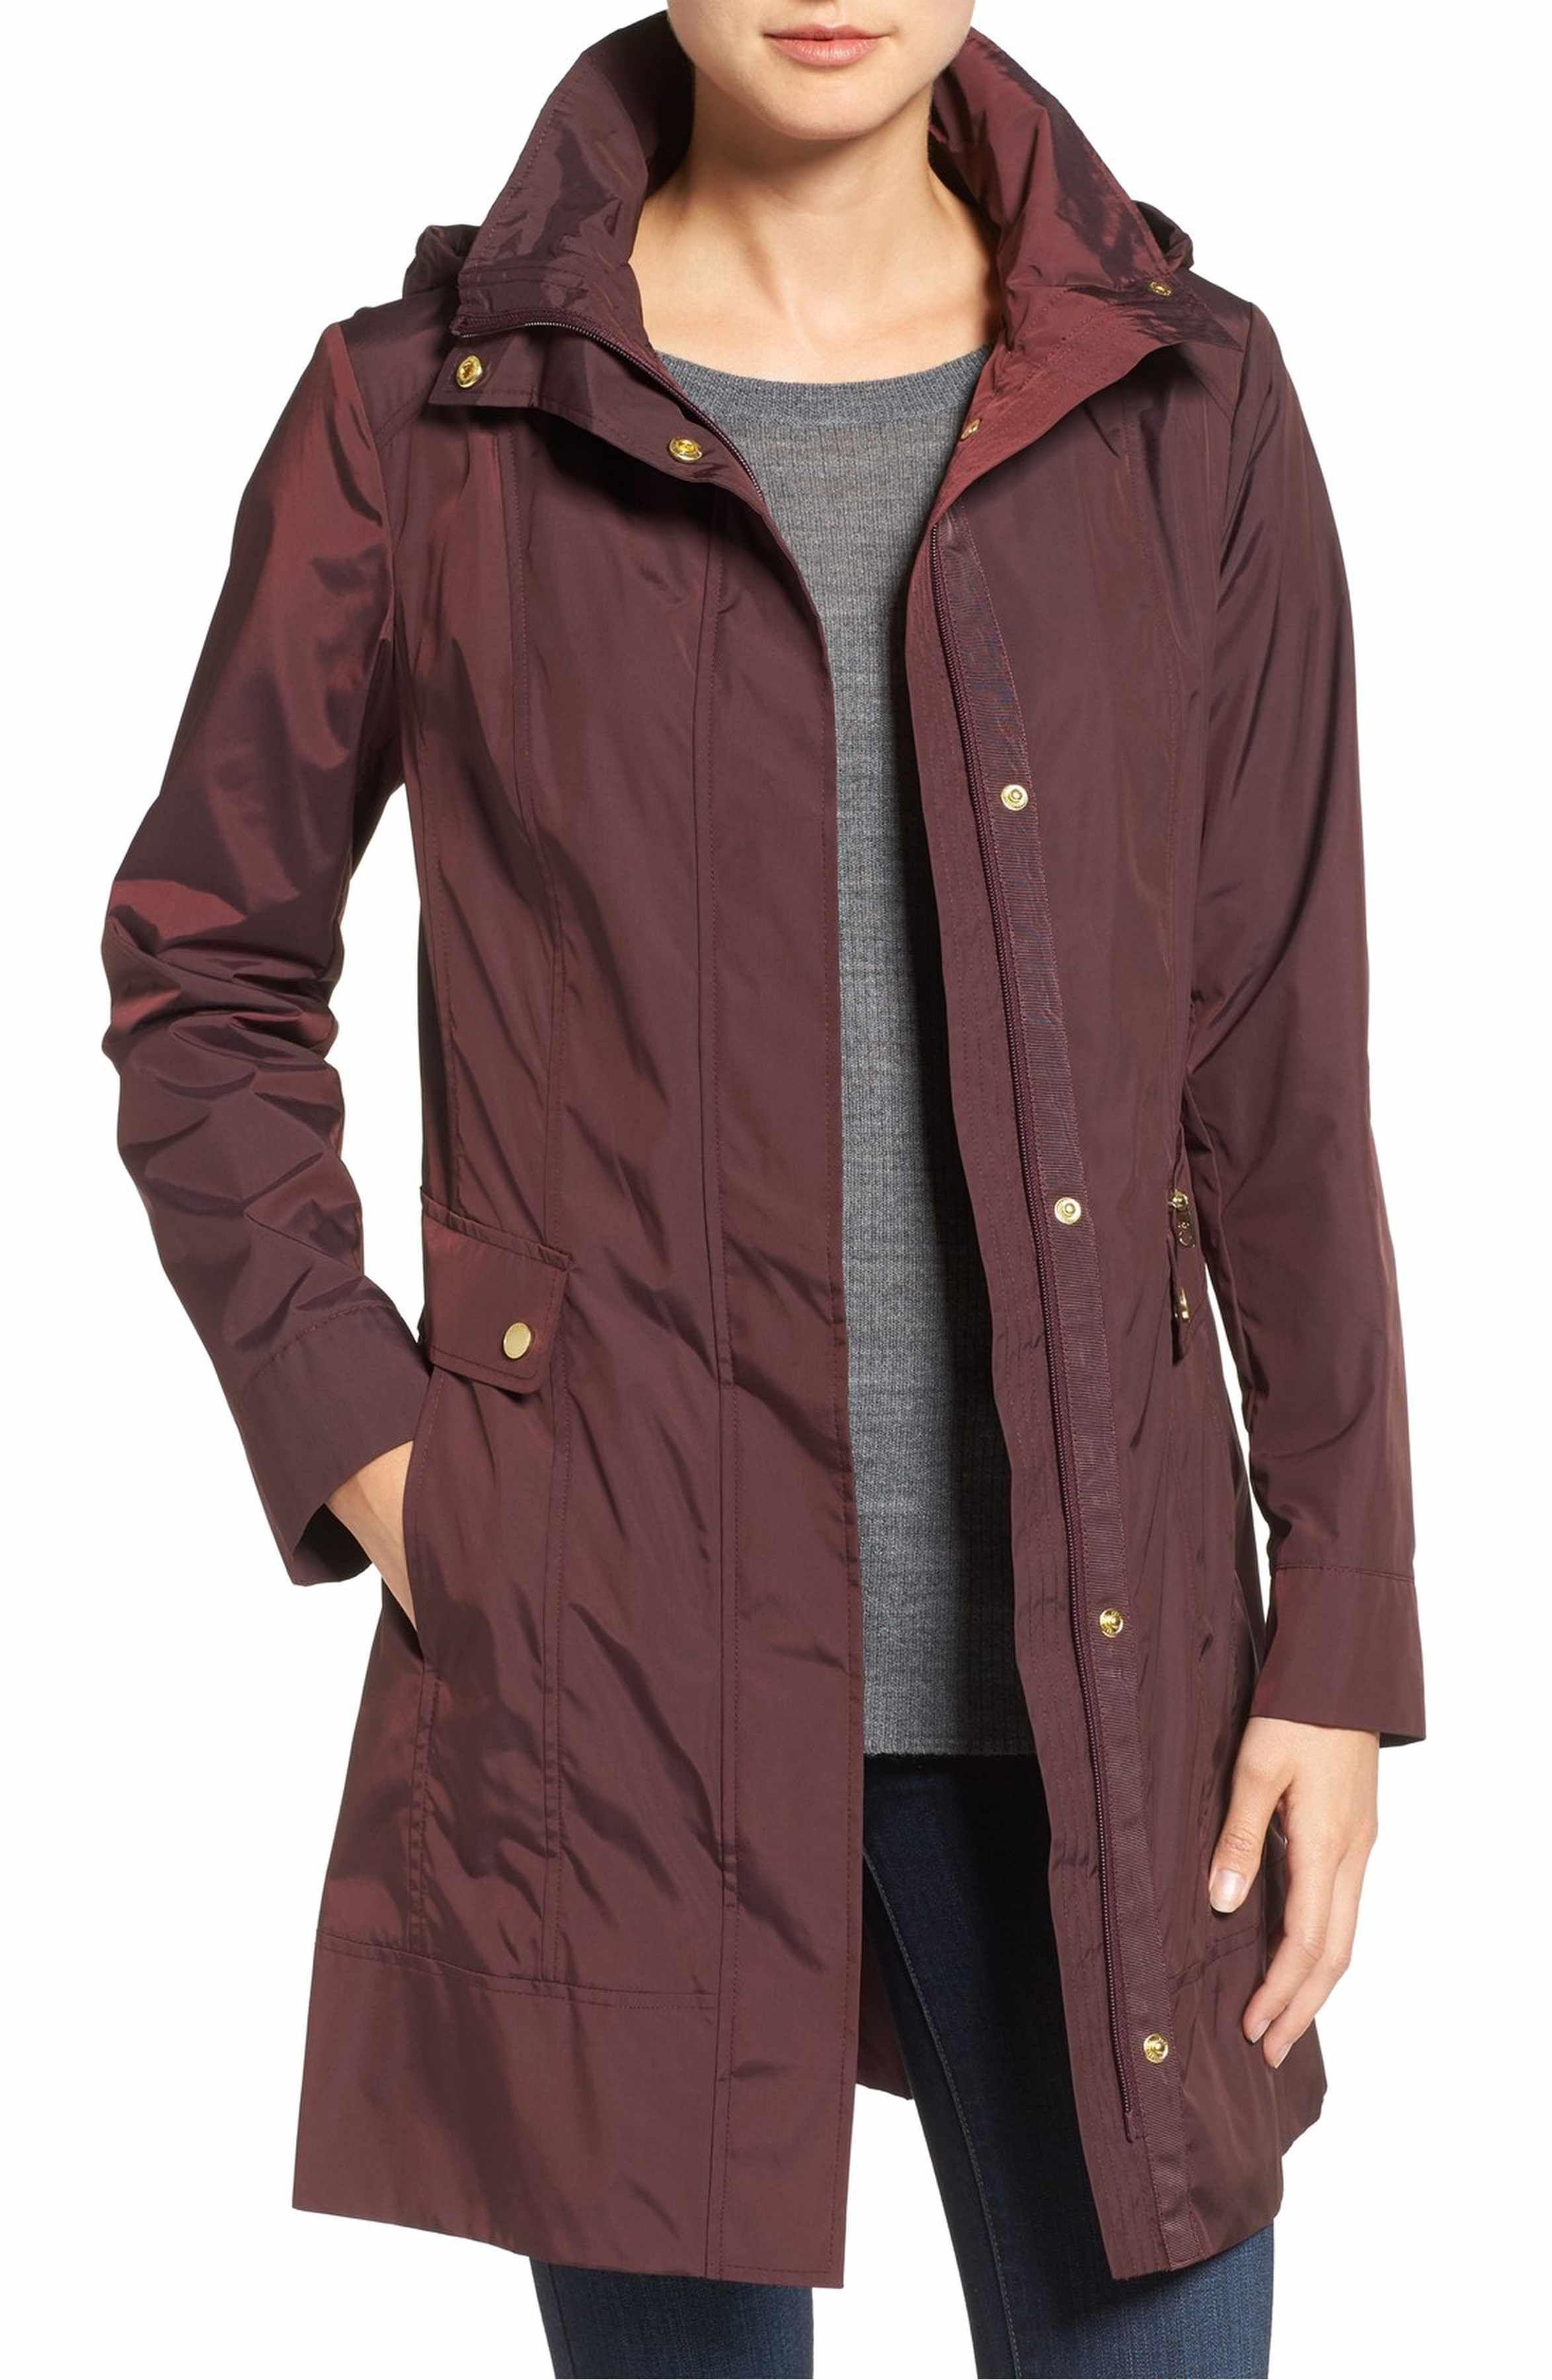 Back Bow Packable Hooded Raincoat. Main Image - Cole Haan Signature Back  Bow Packable Hooded Raincoat (Regular   Petite) d1f534295